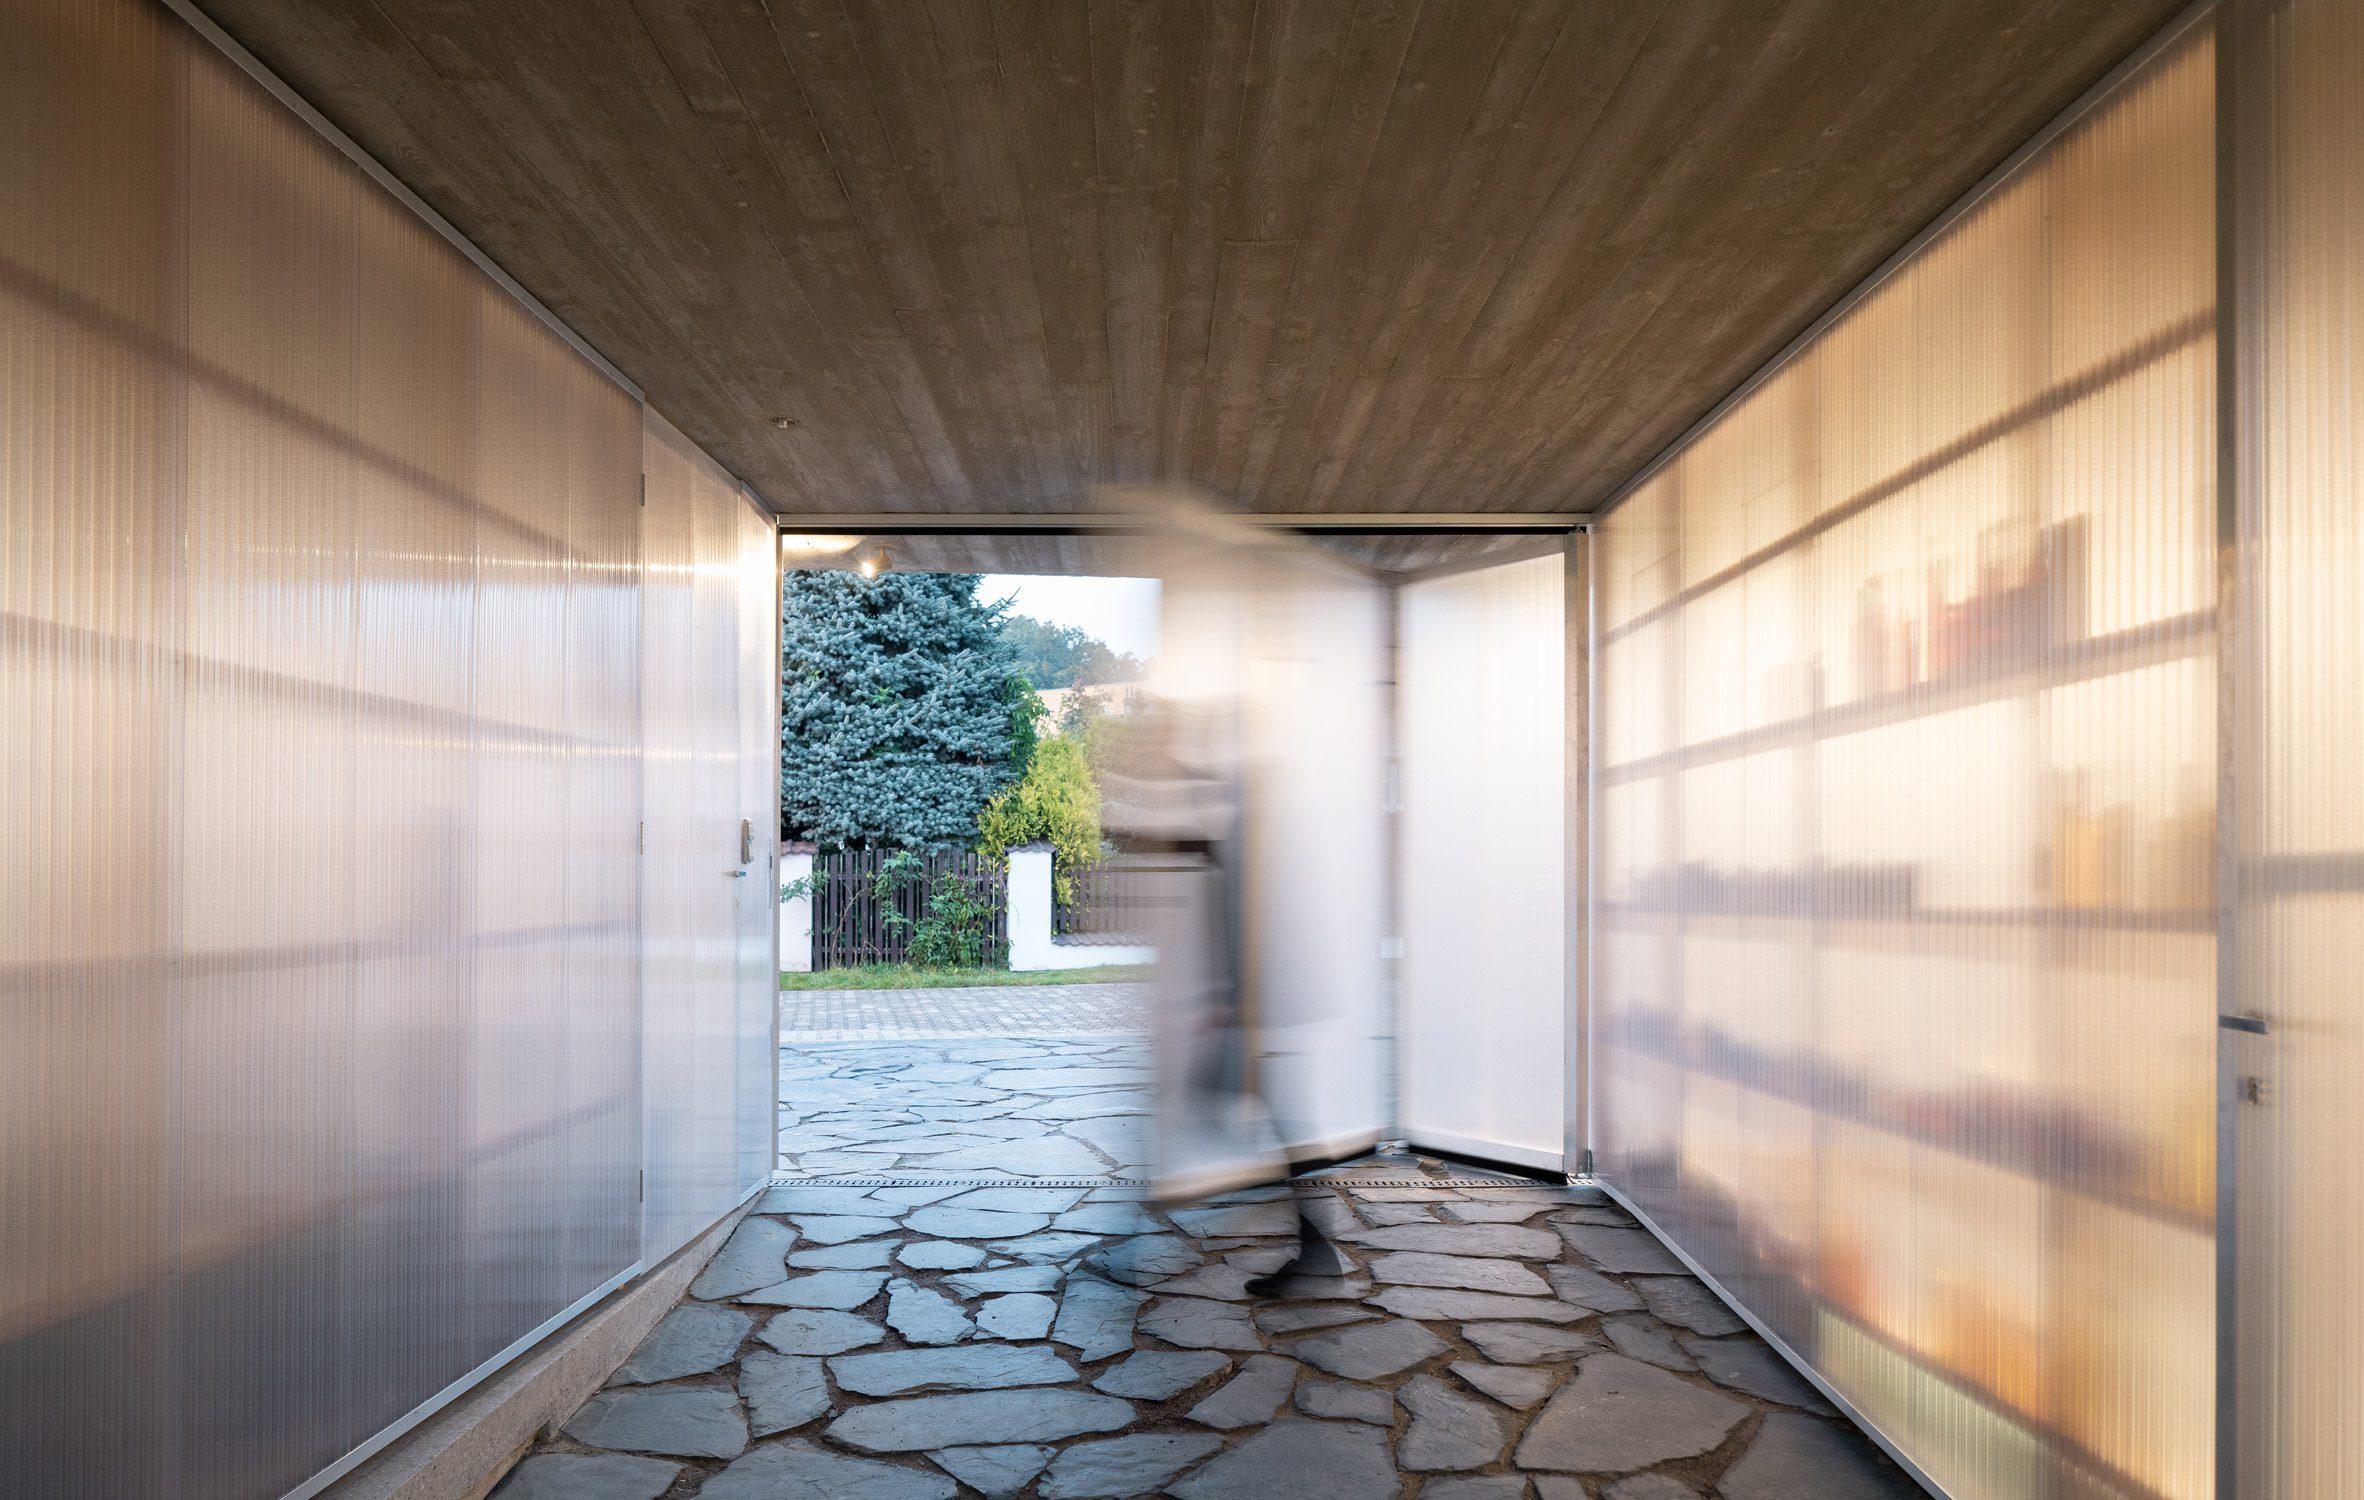 Polycarbonate walls